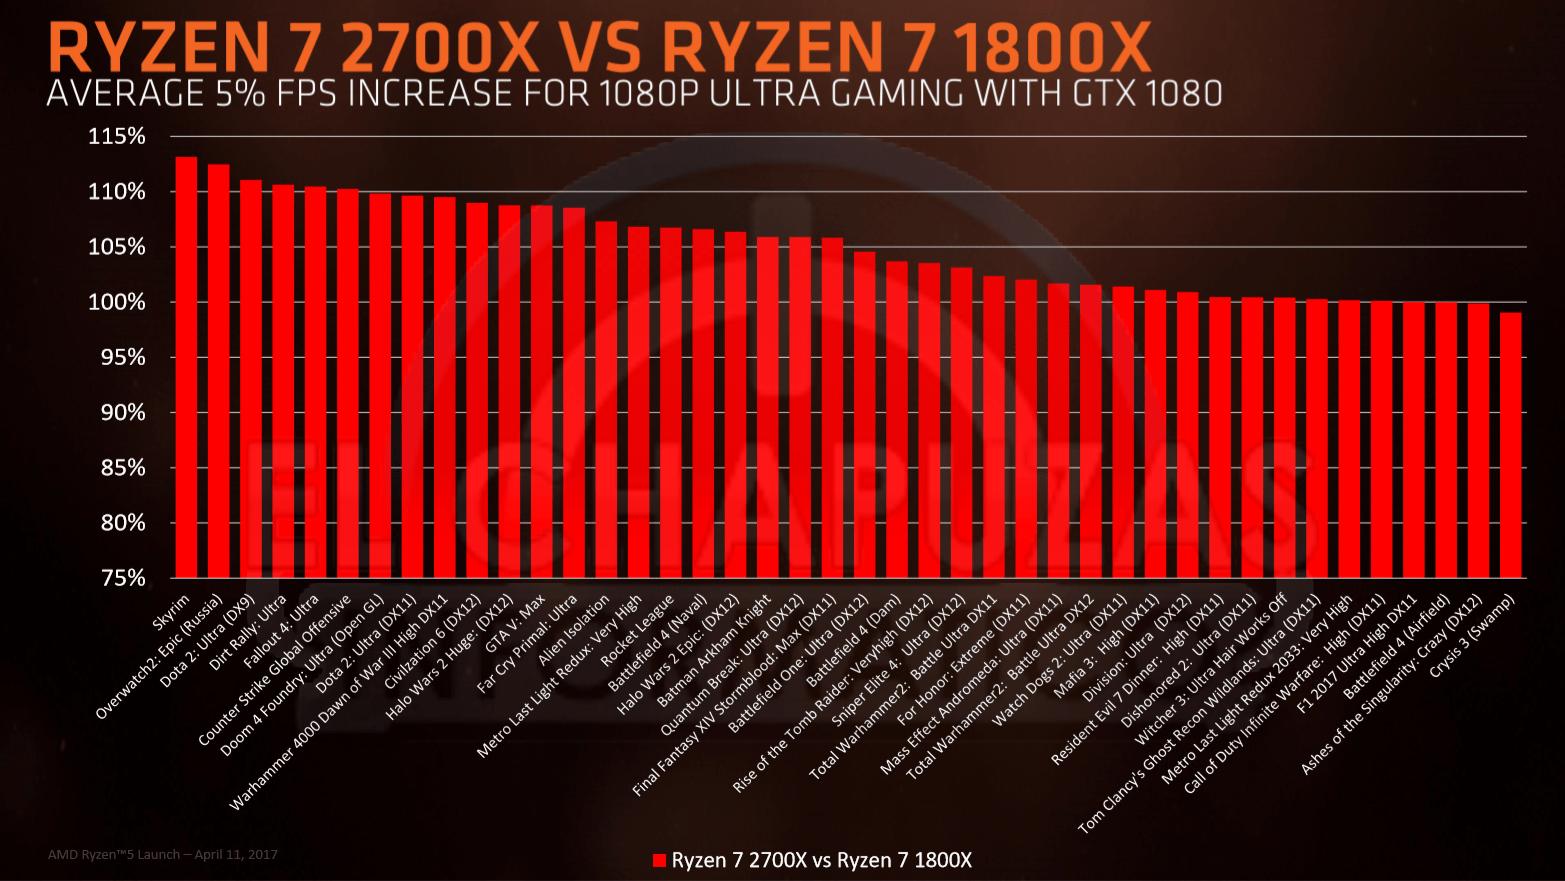 AMD Ryzen 7 2700X vs Ryzen 7 1800X